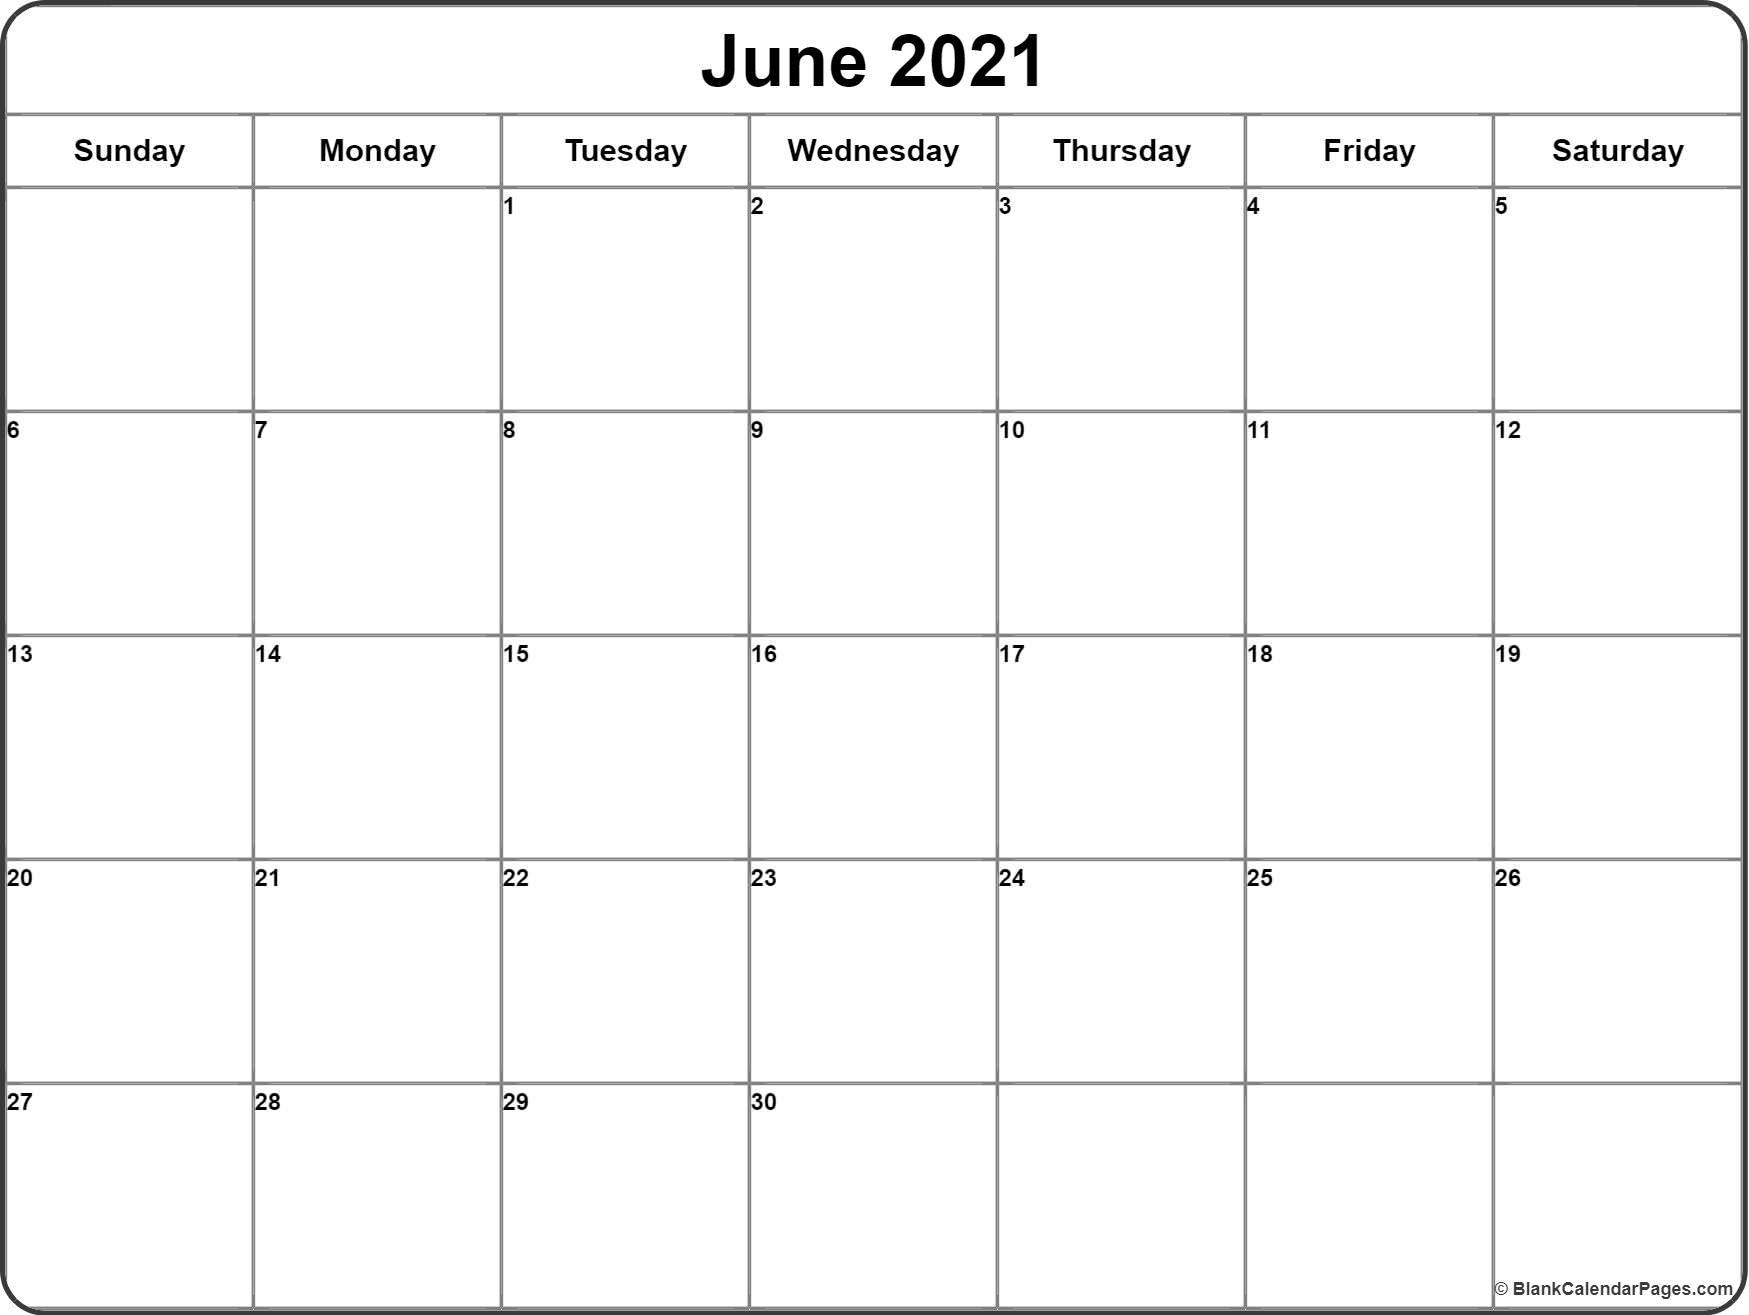 June 2021 Calendar | 51+ Calendar Templates Of 2021 Calendars